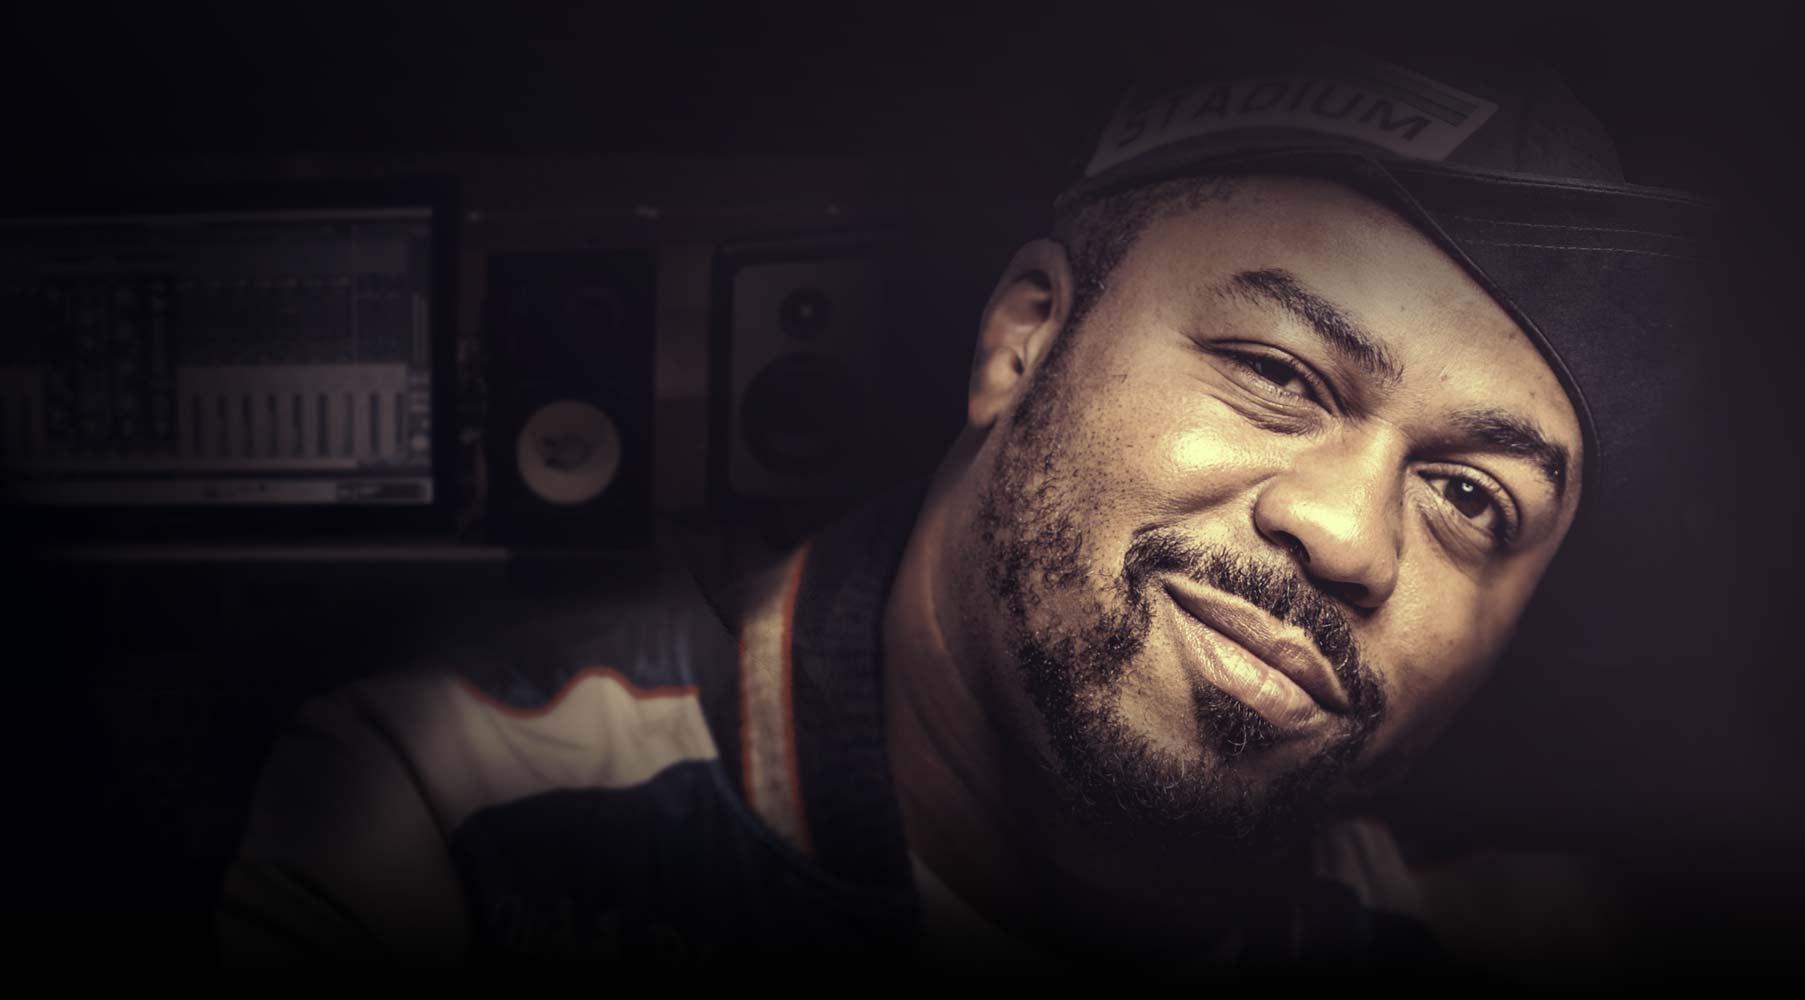 blog_how_to_create_hip_hop_music_hero_1.jpg